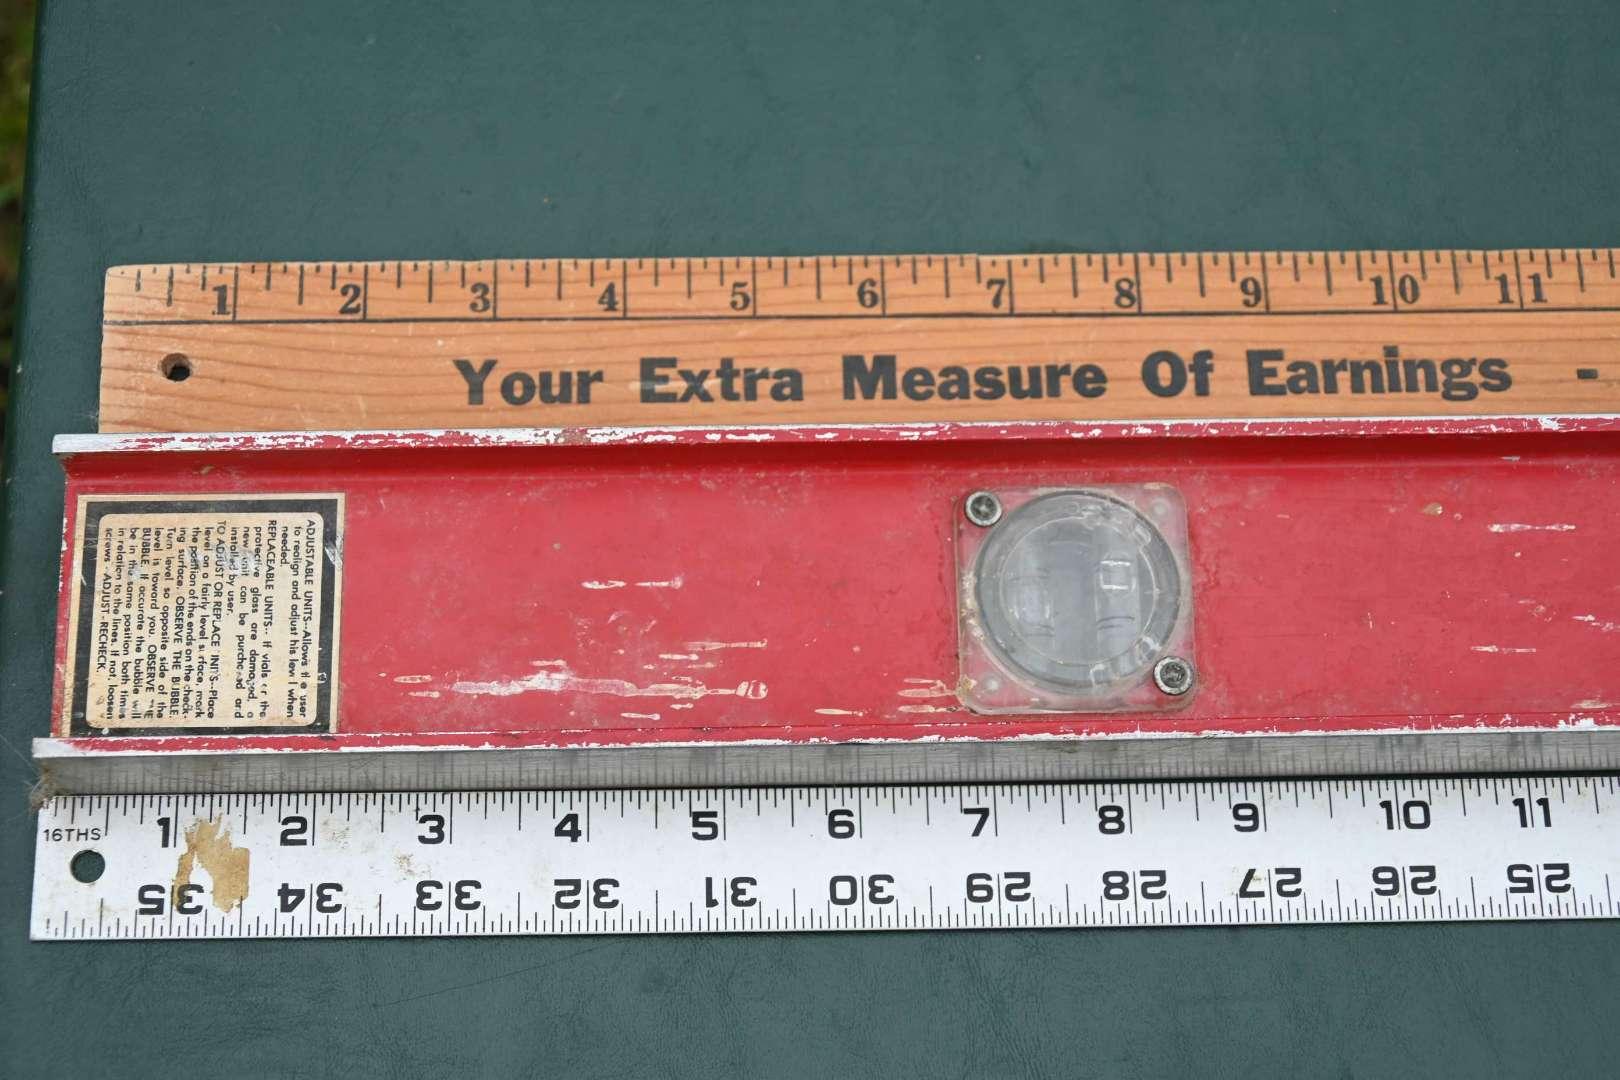 Lot # 144 Yard sticks, leveler, aluminum ruler